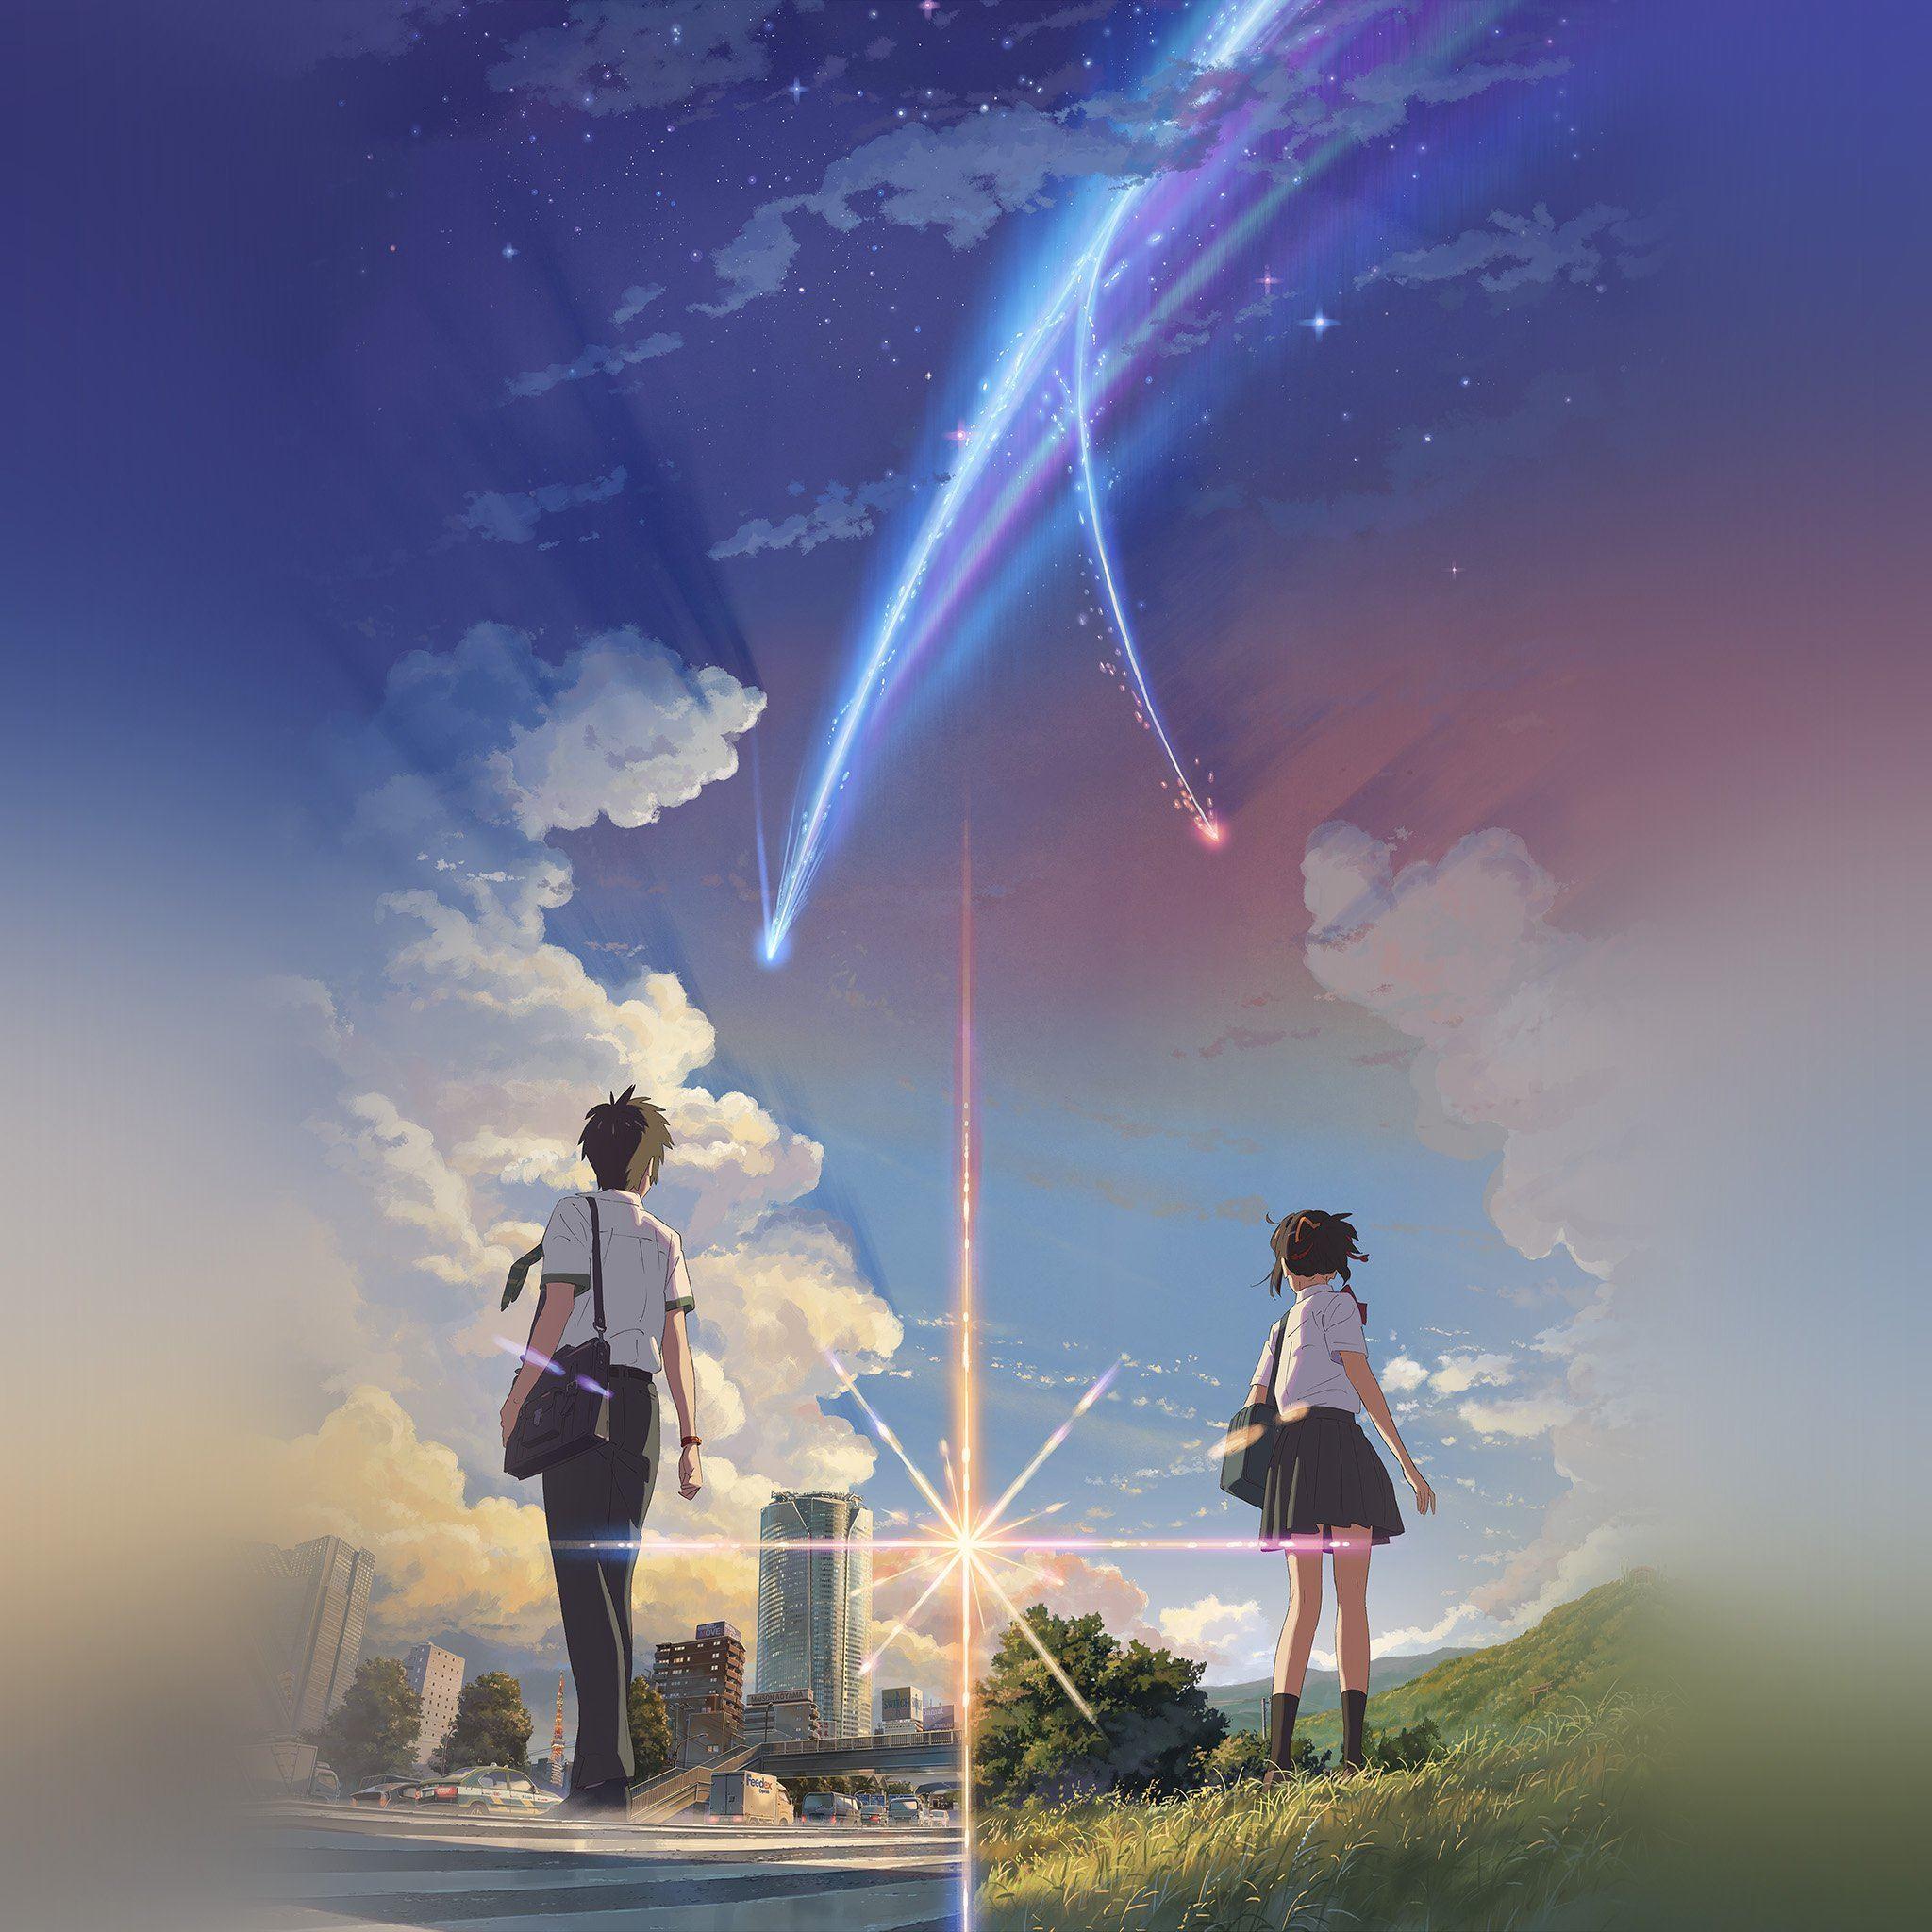 Boy And Girl Anime Art Spring Cute IPad Air Wallpaper